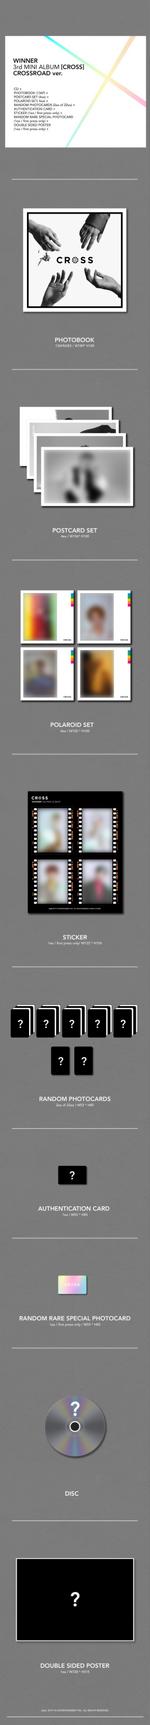 WINNER Cross album packaging (Crossroad)